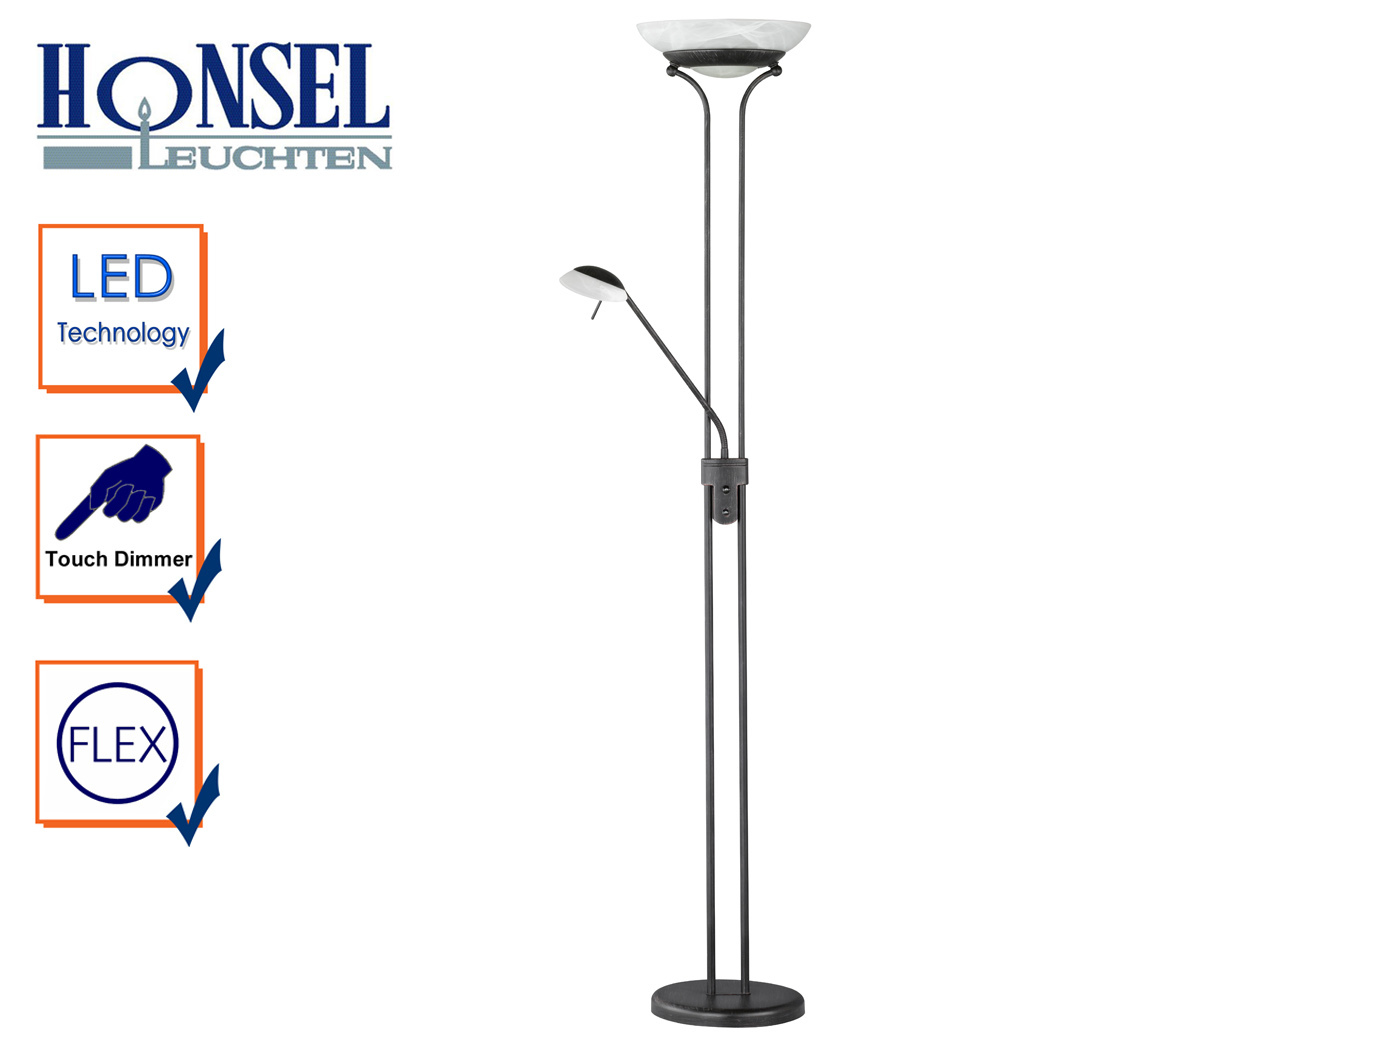 Design Led Deckenfluter Dimmbar Mit Leselampe Rostfarbig Stehlampe